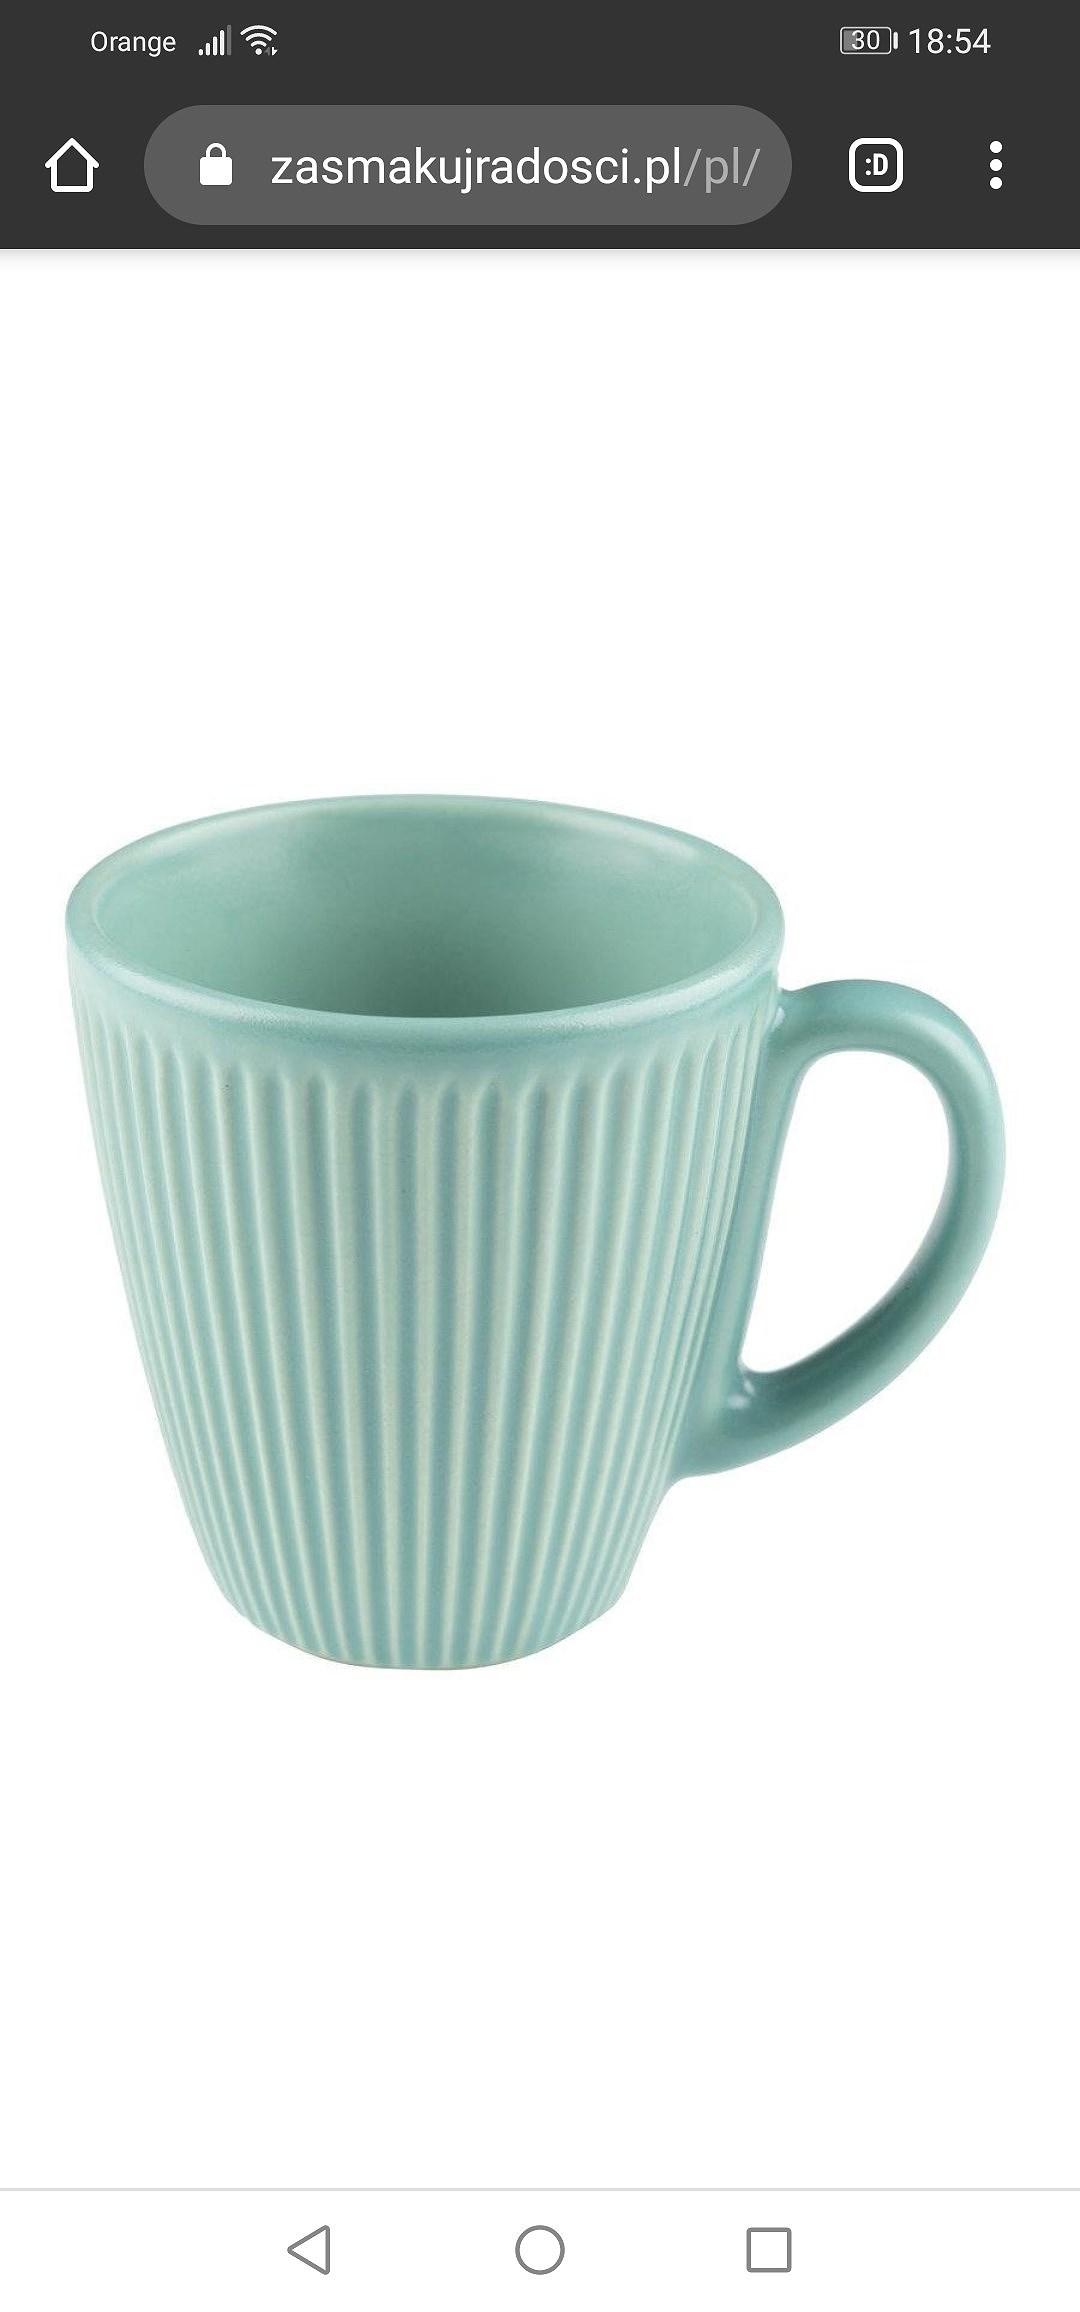 https://zasmakujradosci.pl/pl/products/kubek-ceramiczny-florina-capri-morski-260-ml-3276.html